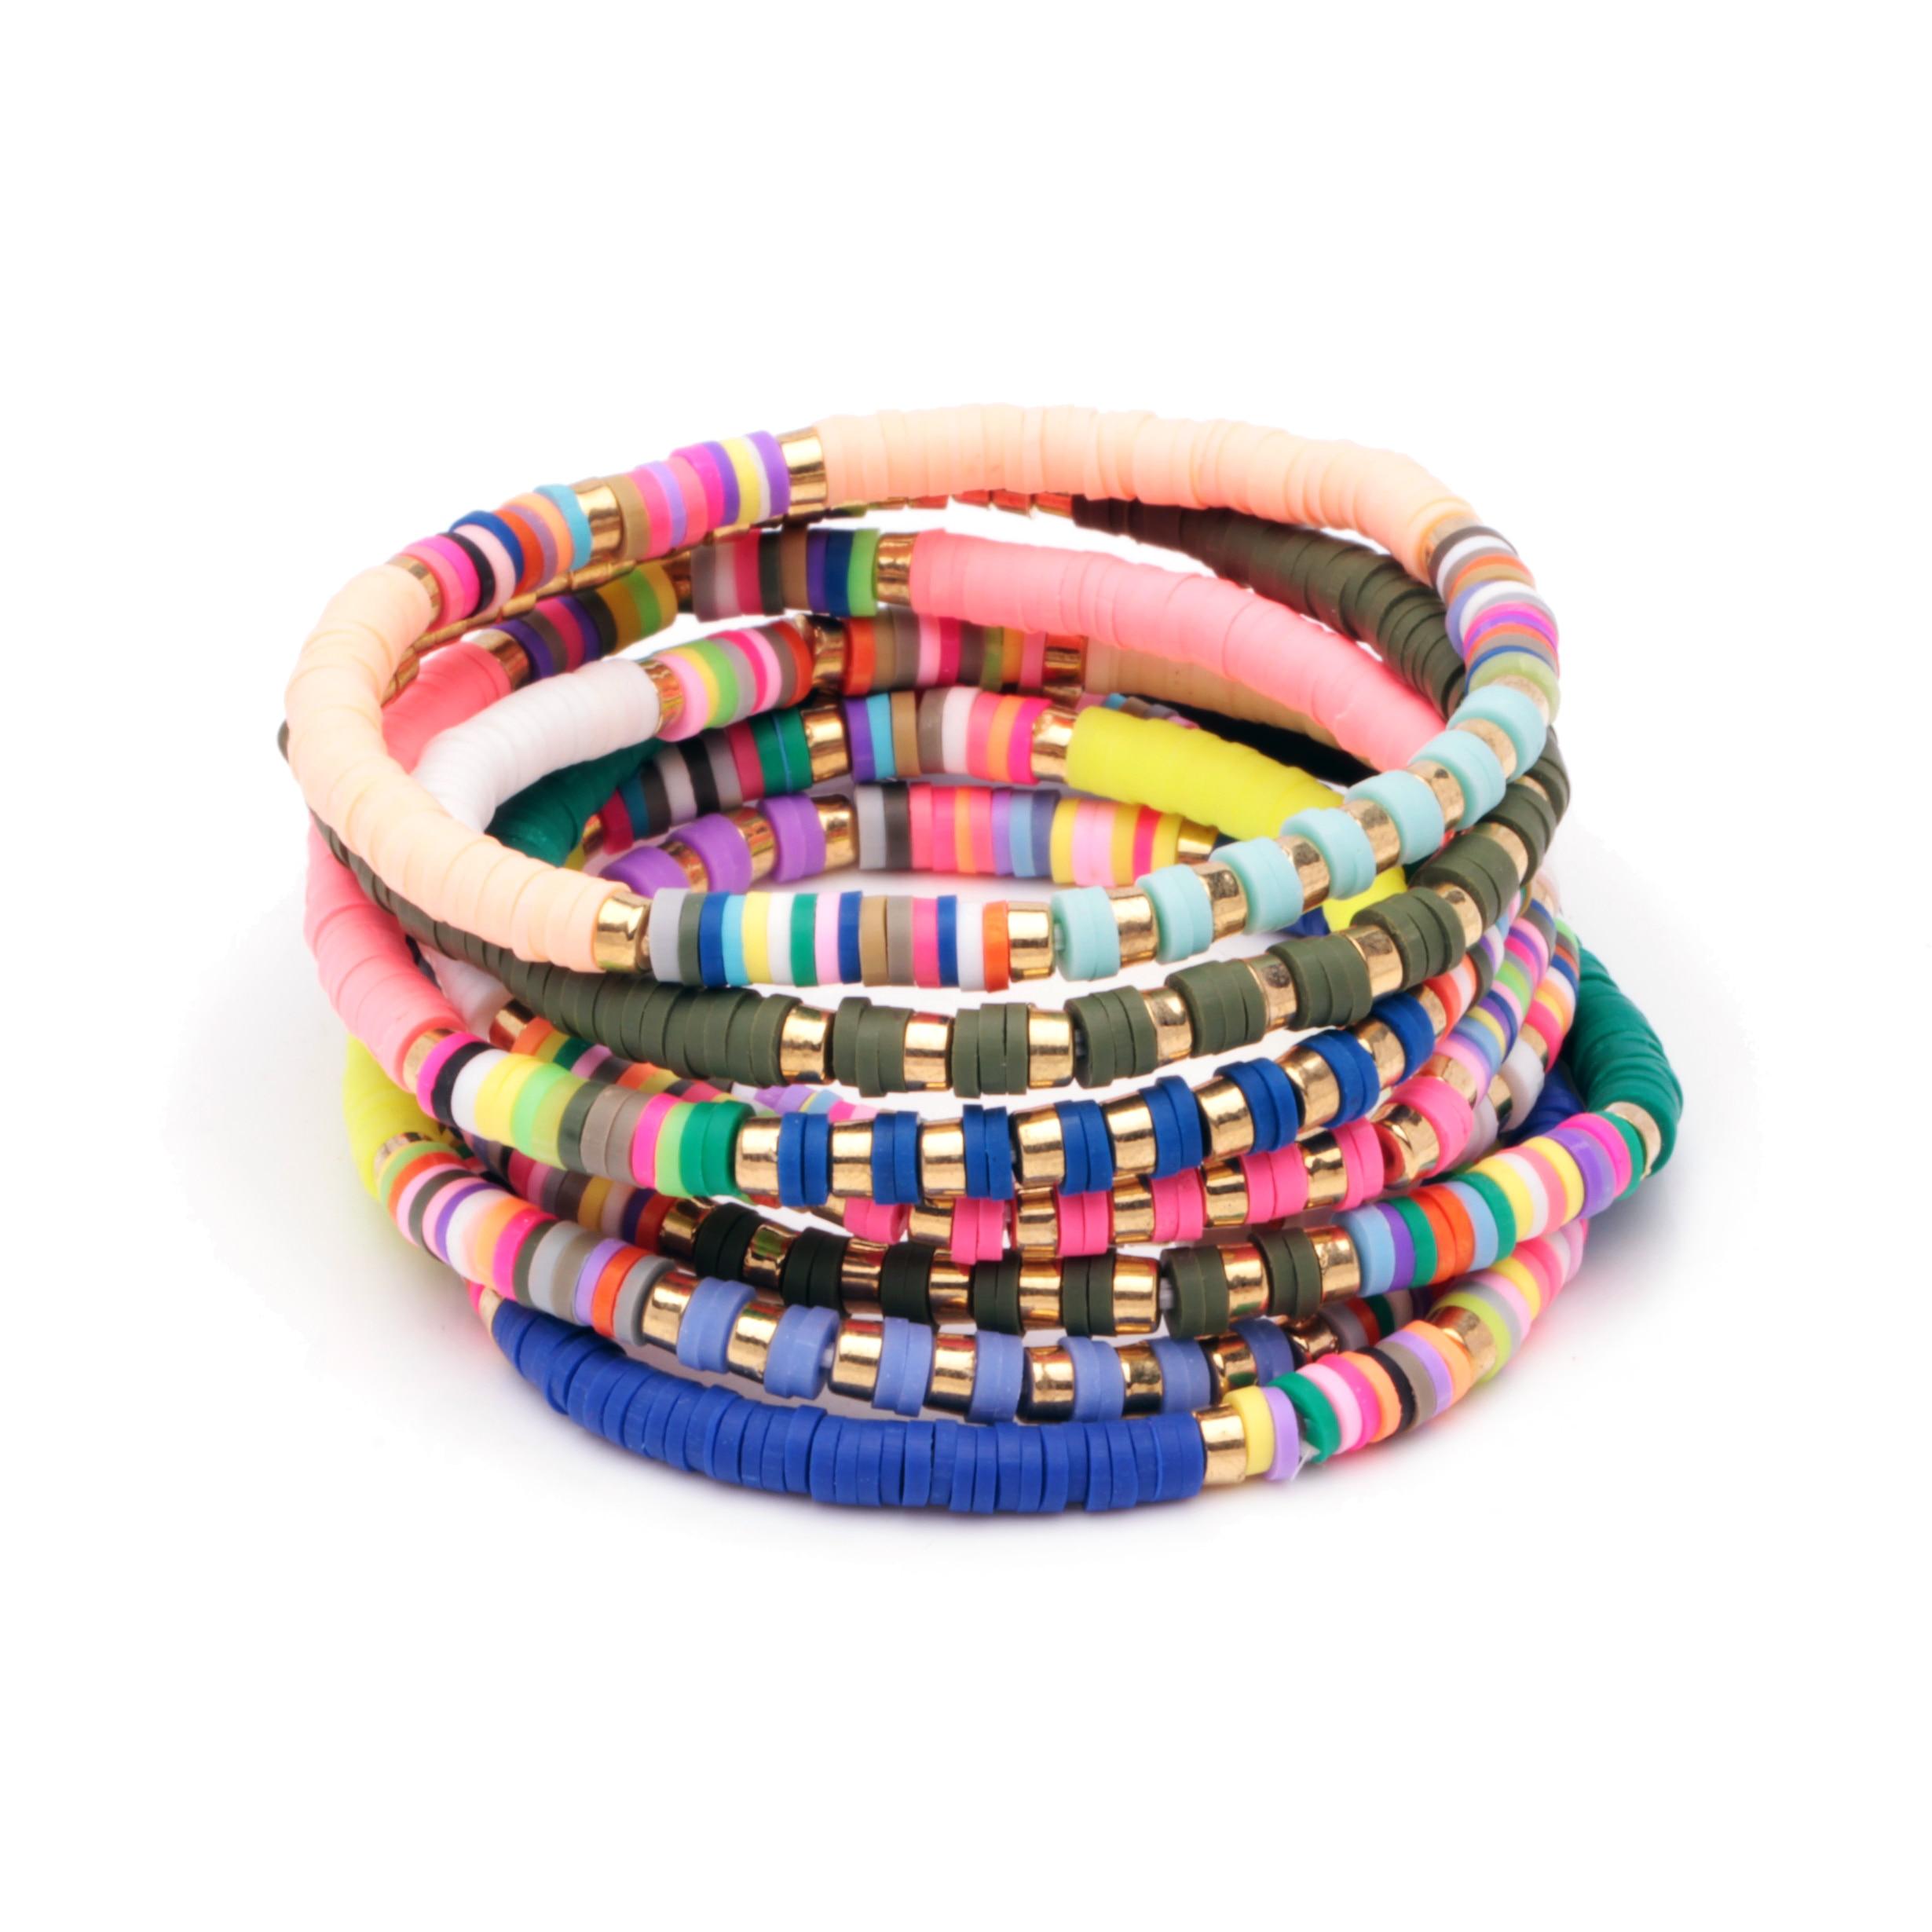 Mix Vinyl Heishi Discs Bead Stretch Bracelet Women Men Colorful CCB Spacer Bead Polymer Clay Natural Tubular Bracelets Nova Gift